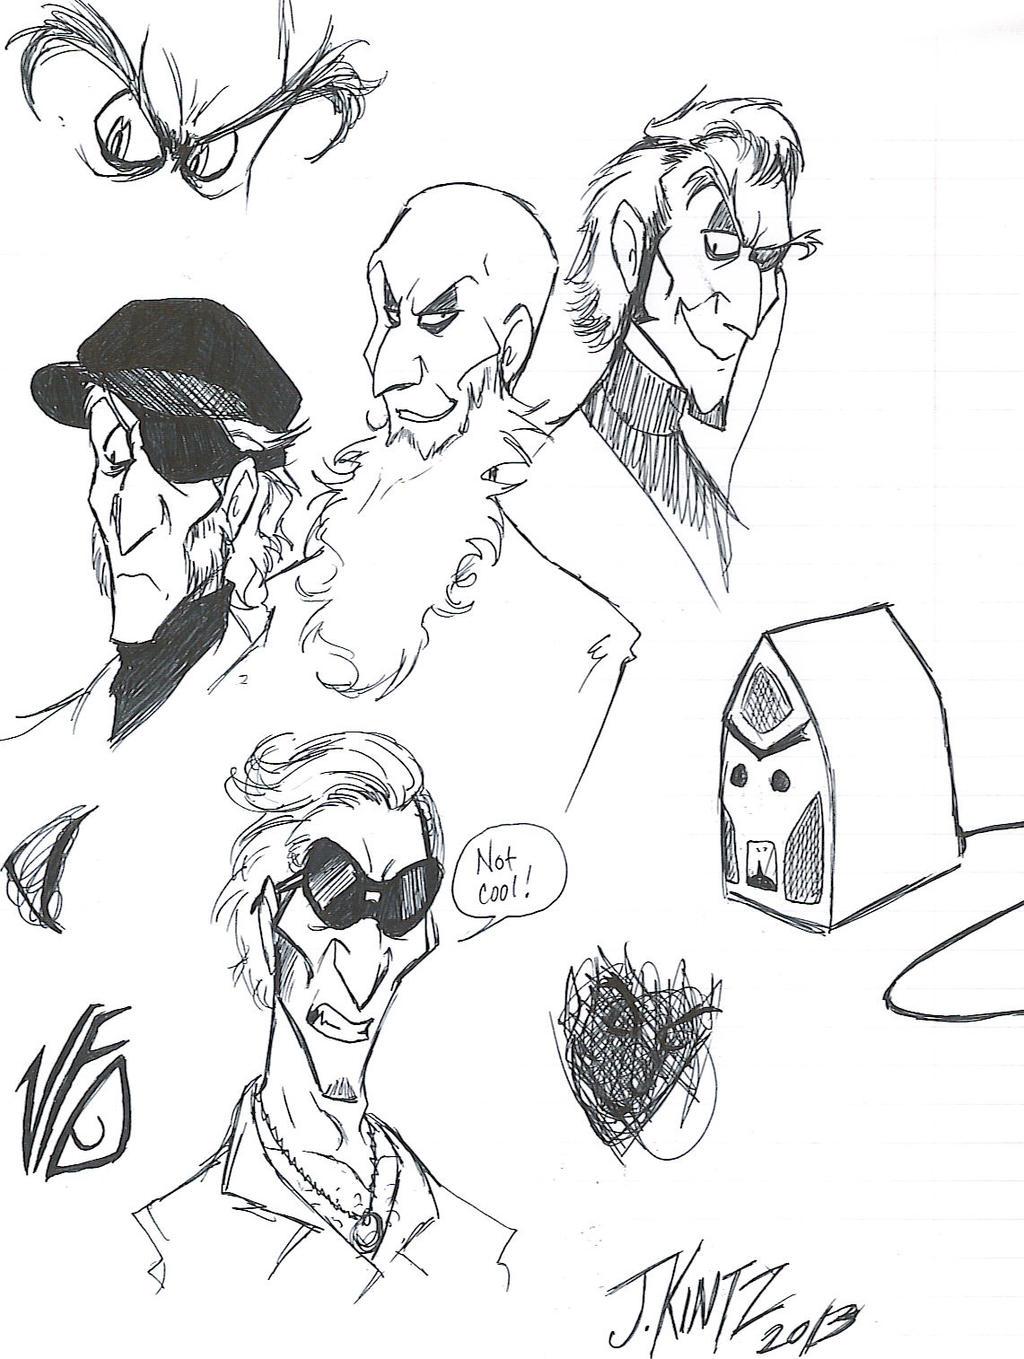 Count Olaf Sketchdump by Rinkusu001 on DeviantArt